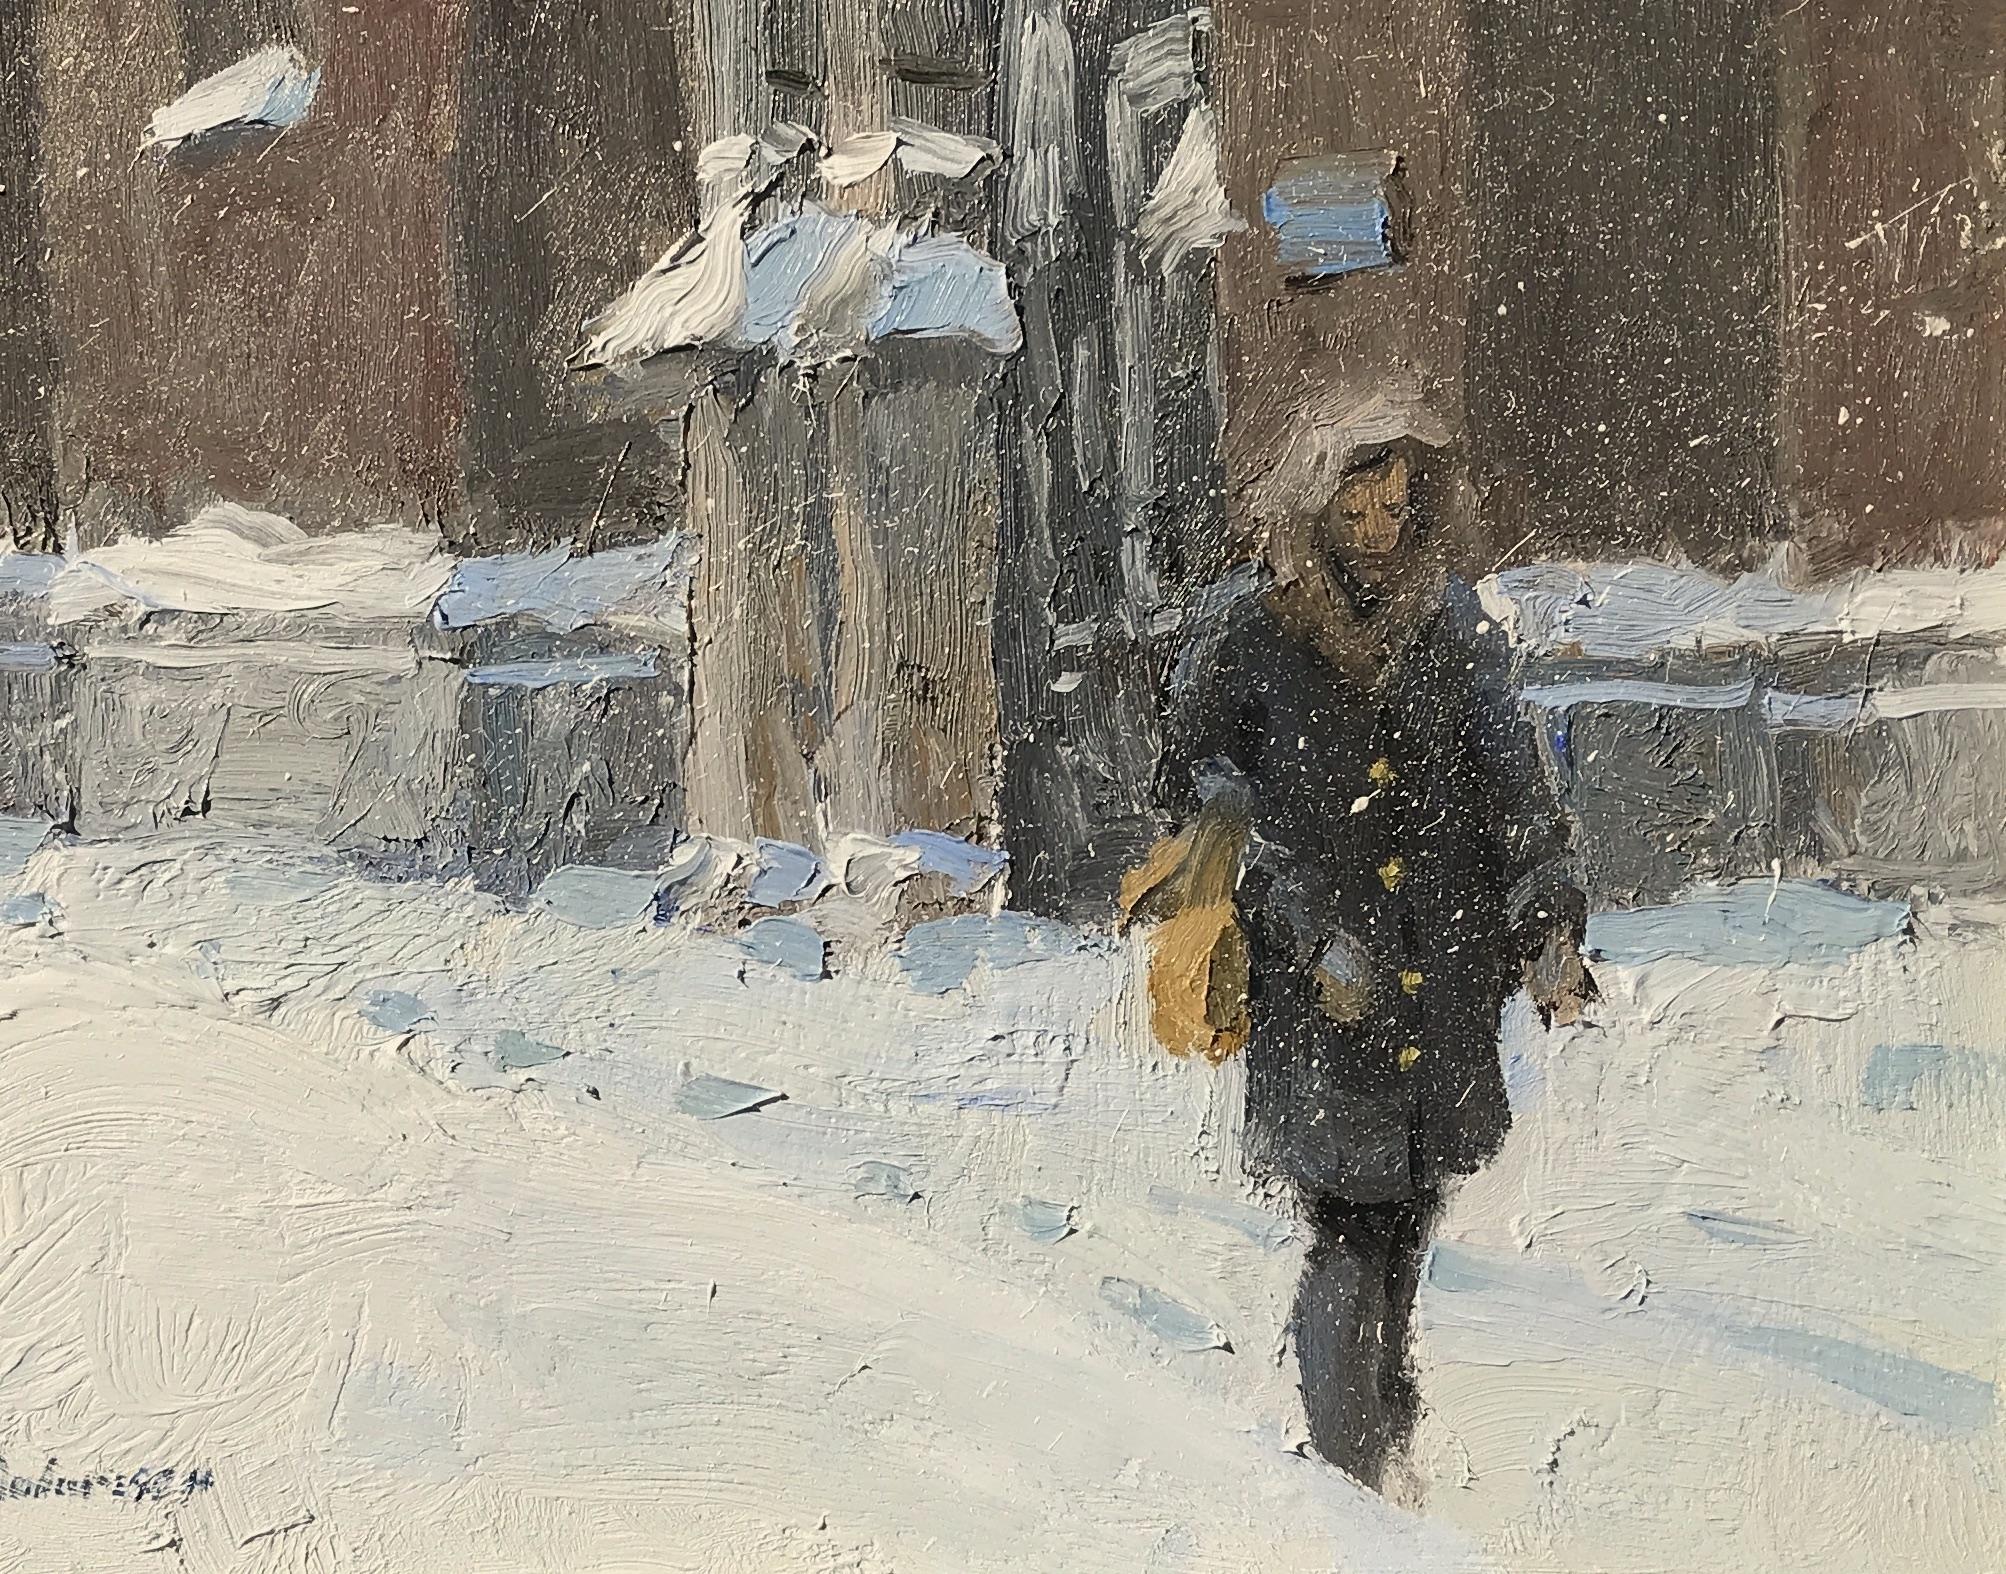 Doloresco-Still Snowing-cropped